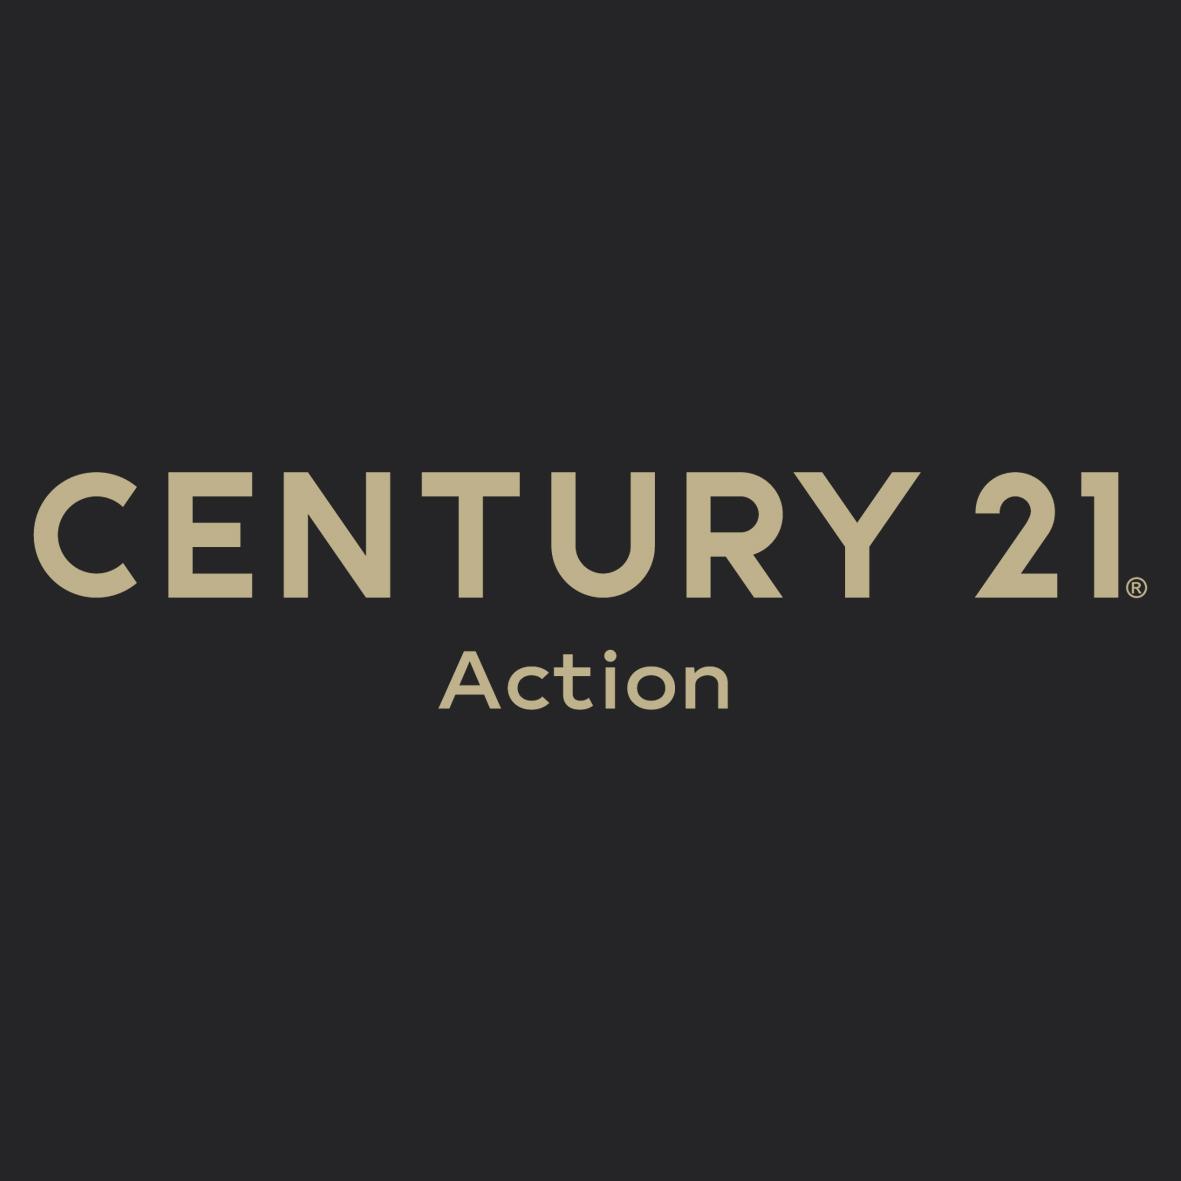 CENTURY 21 Action